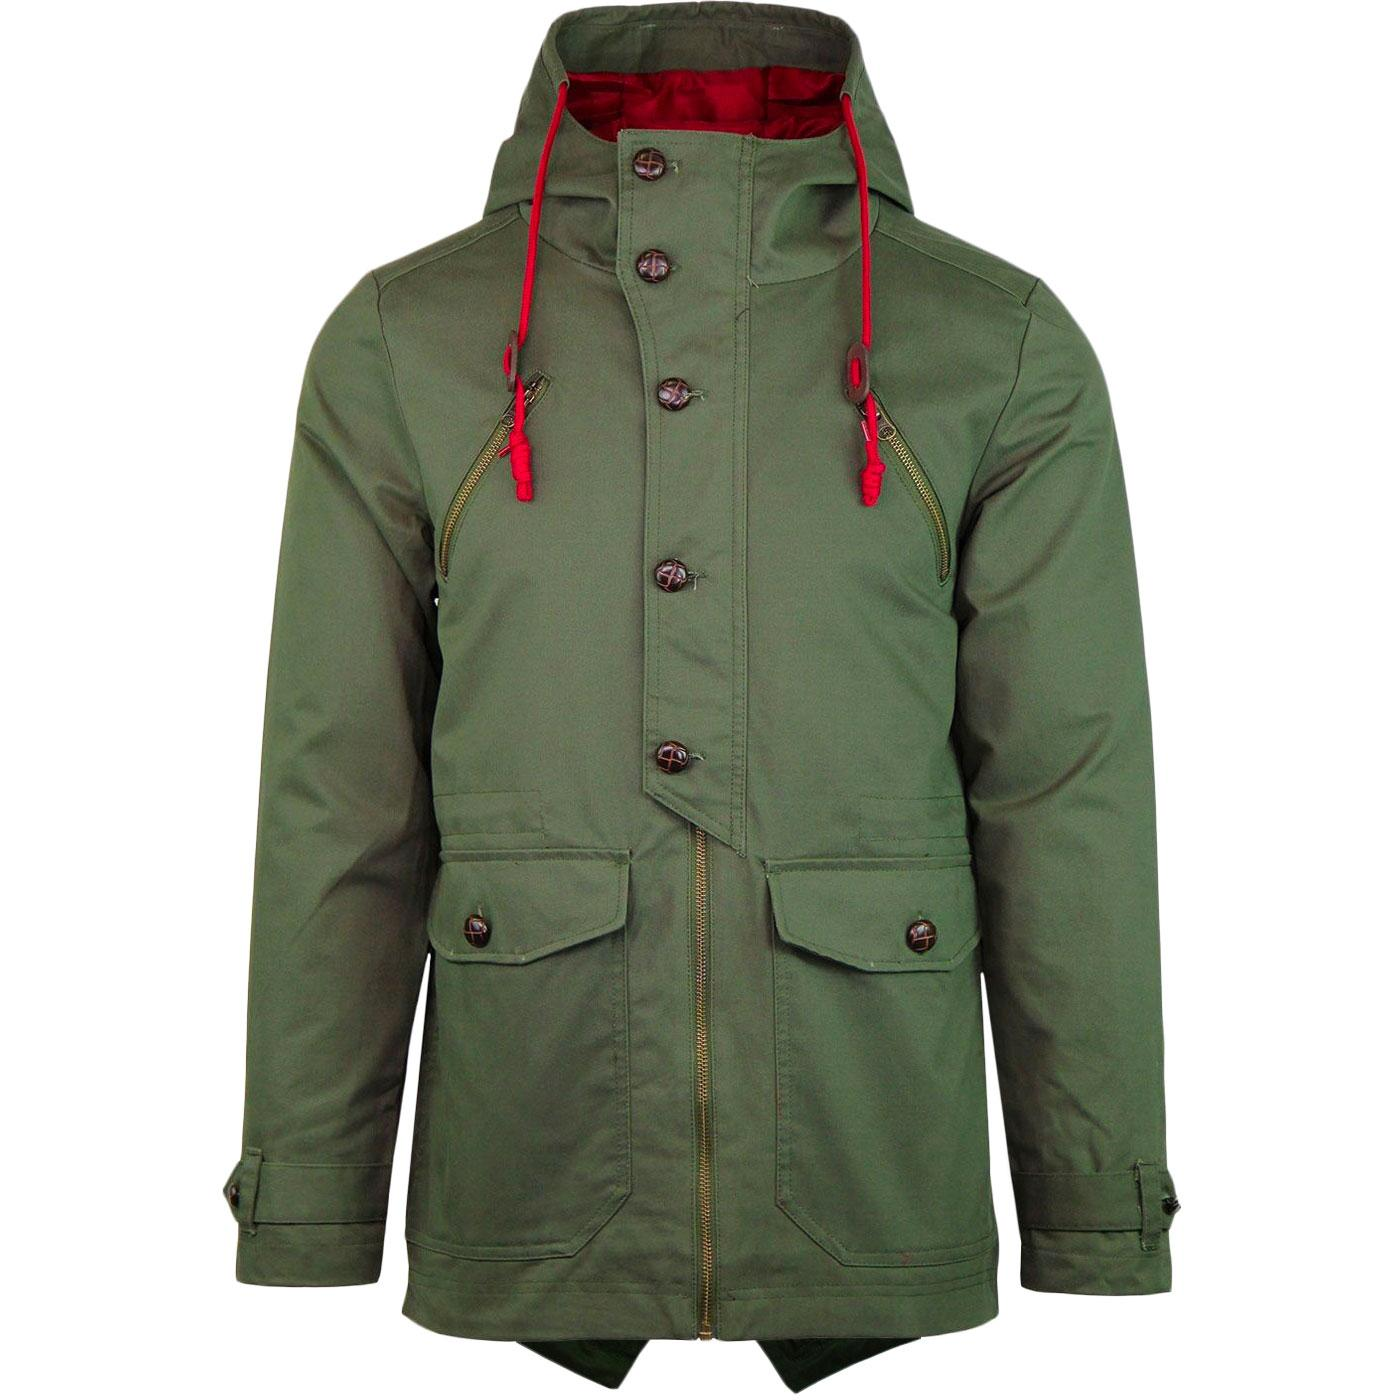 Alfie MADCAP ENGLAND Mod Fishtail Parka Jacket